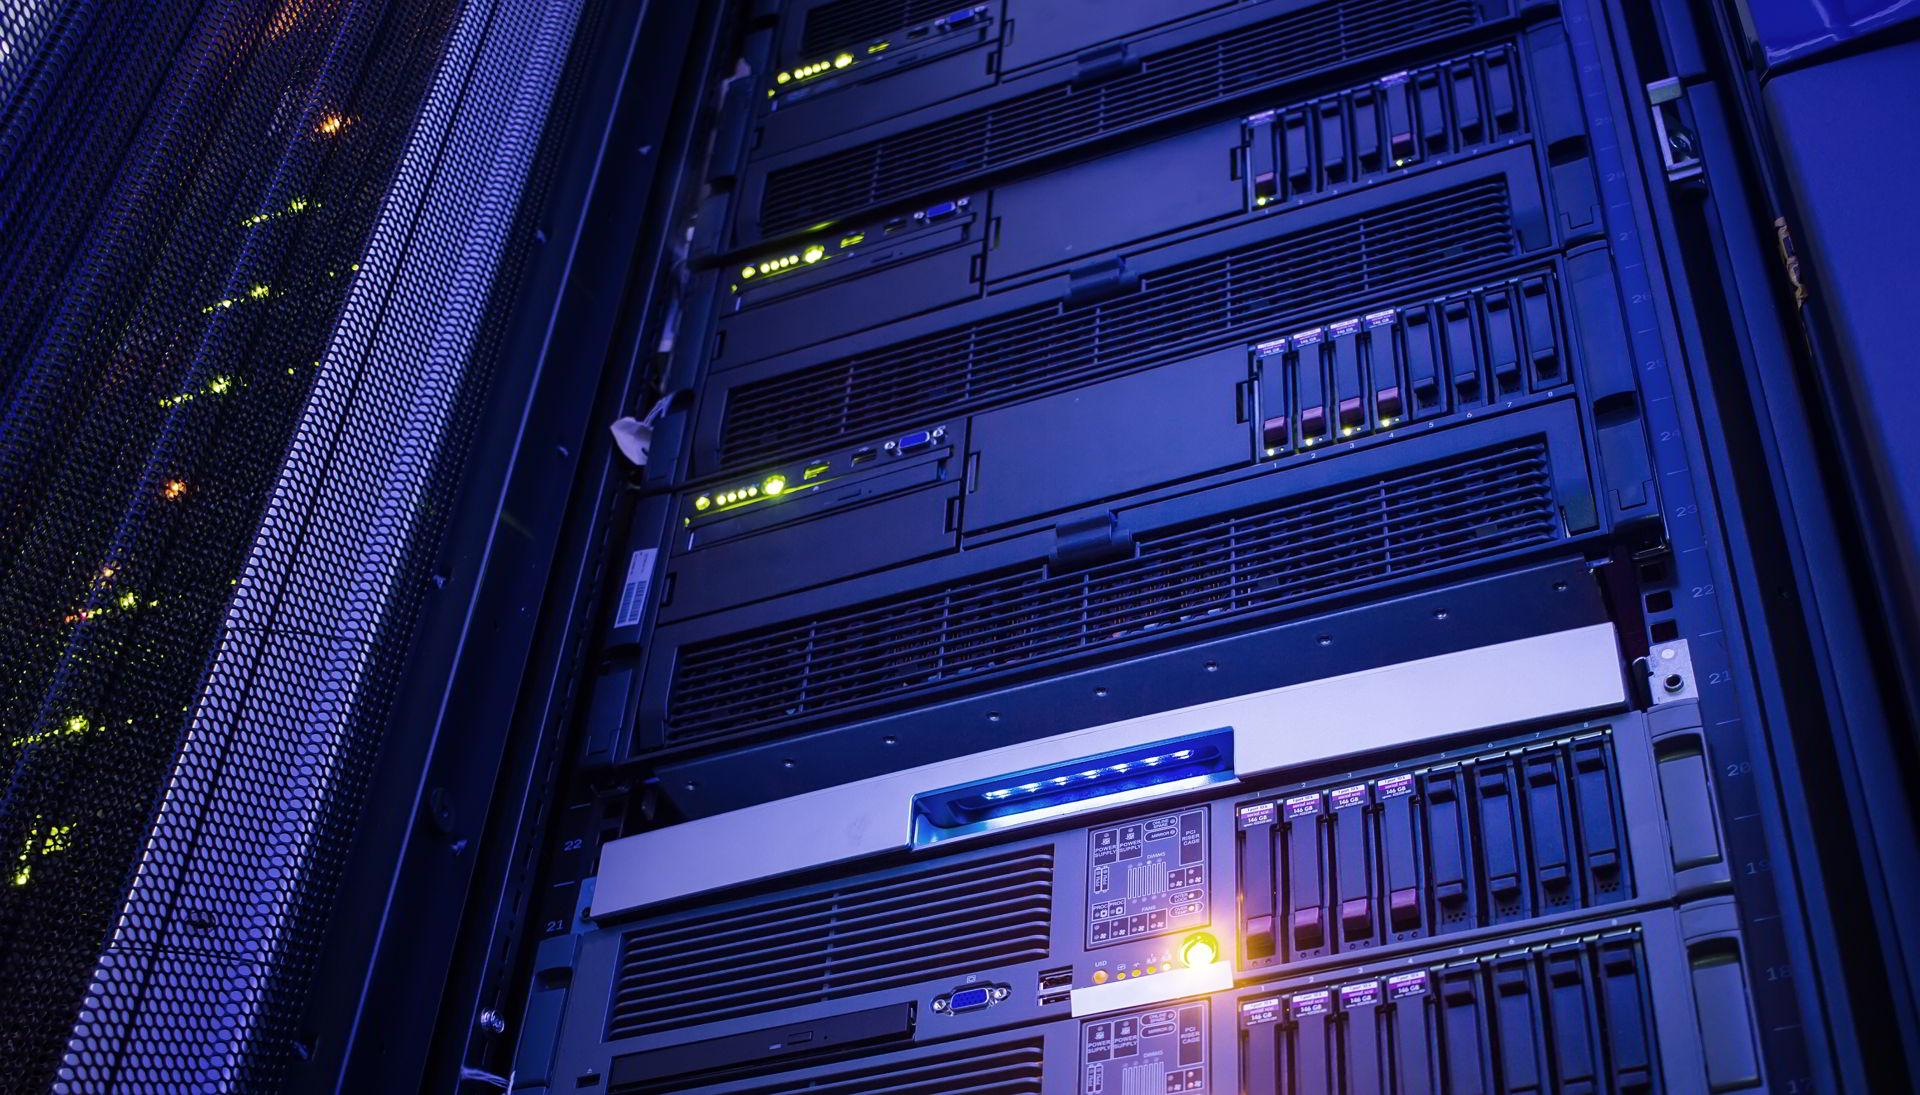 De 9 ani furnizor de servicii Data Center